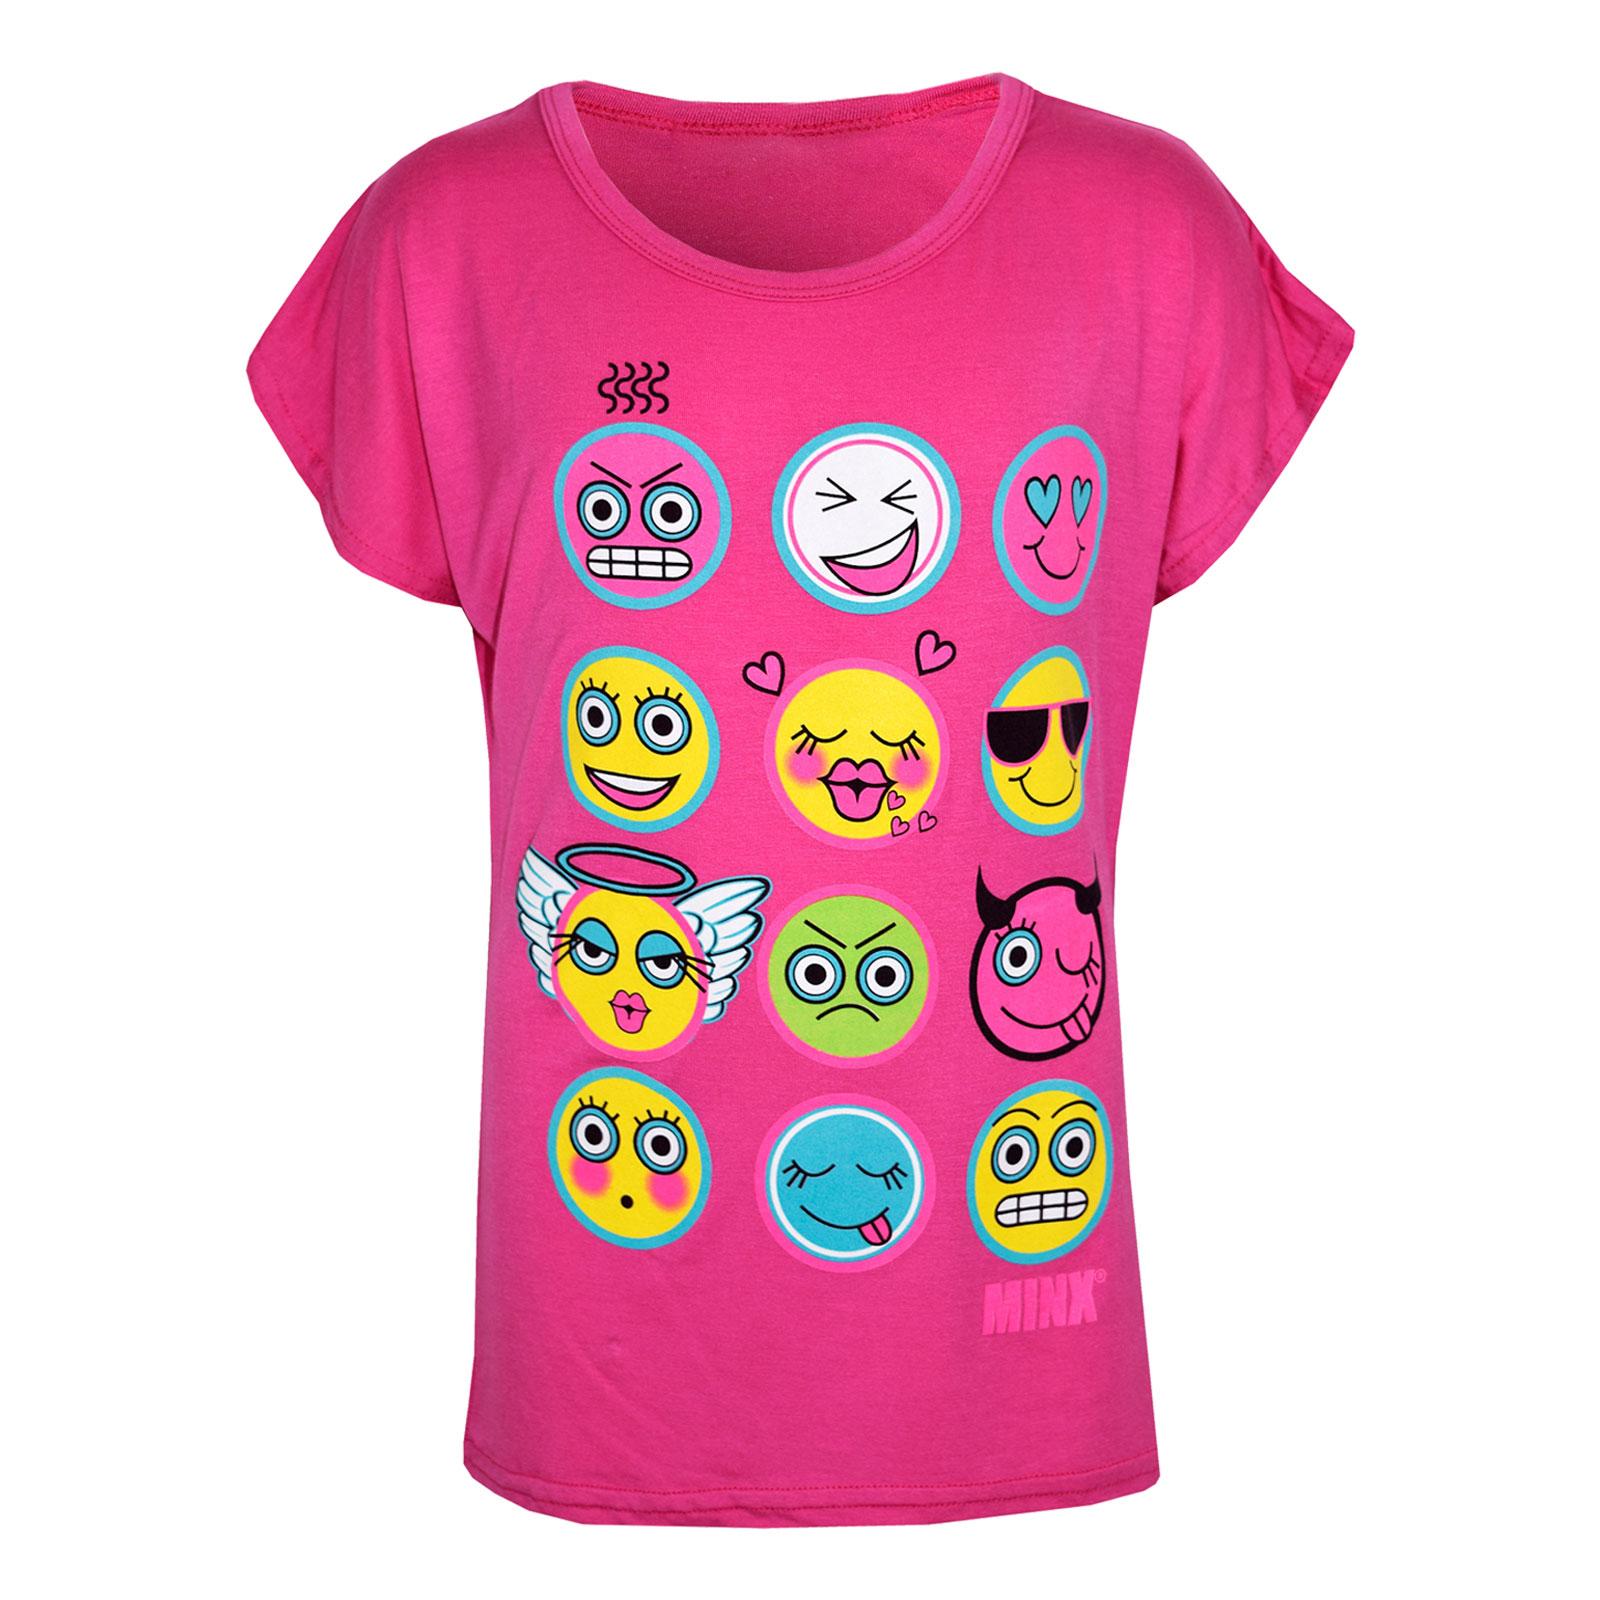 Kids Girls T Shirt Emoji Emotions Print Stylish Trendy ...